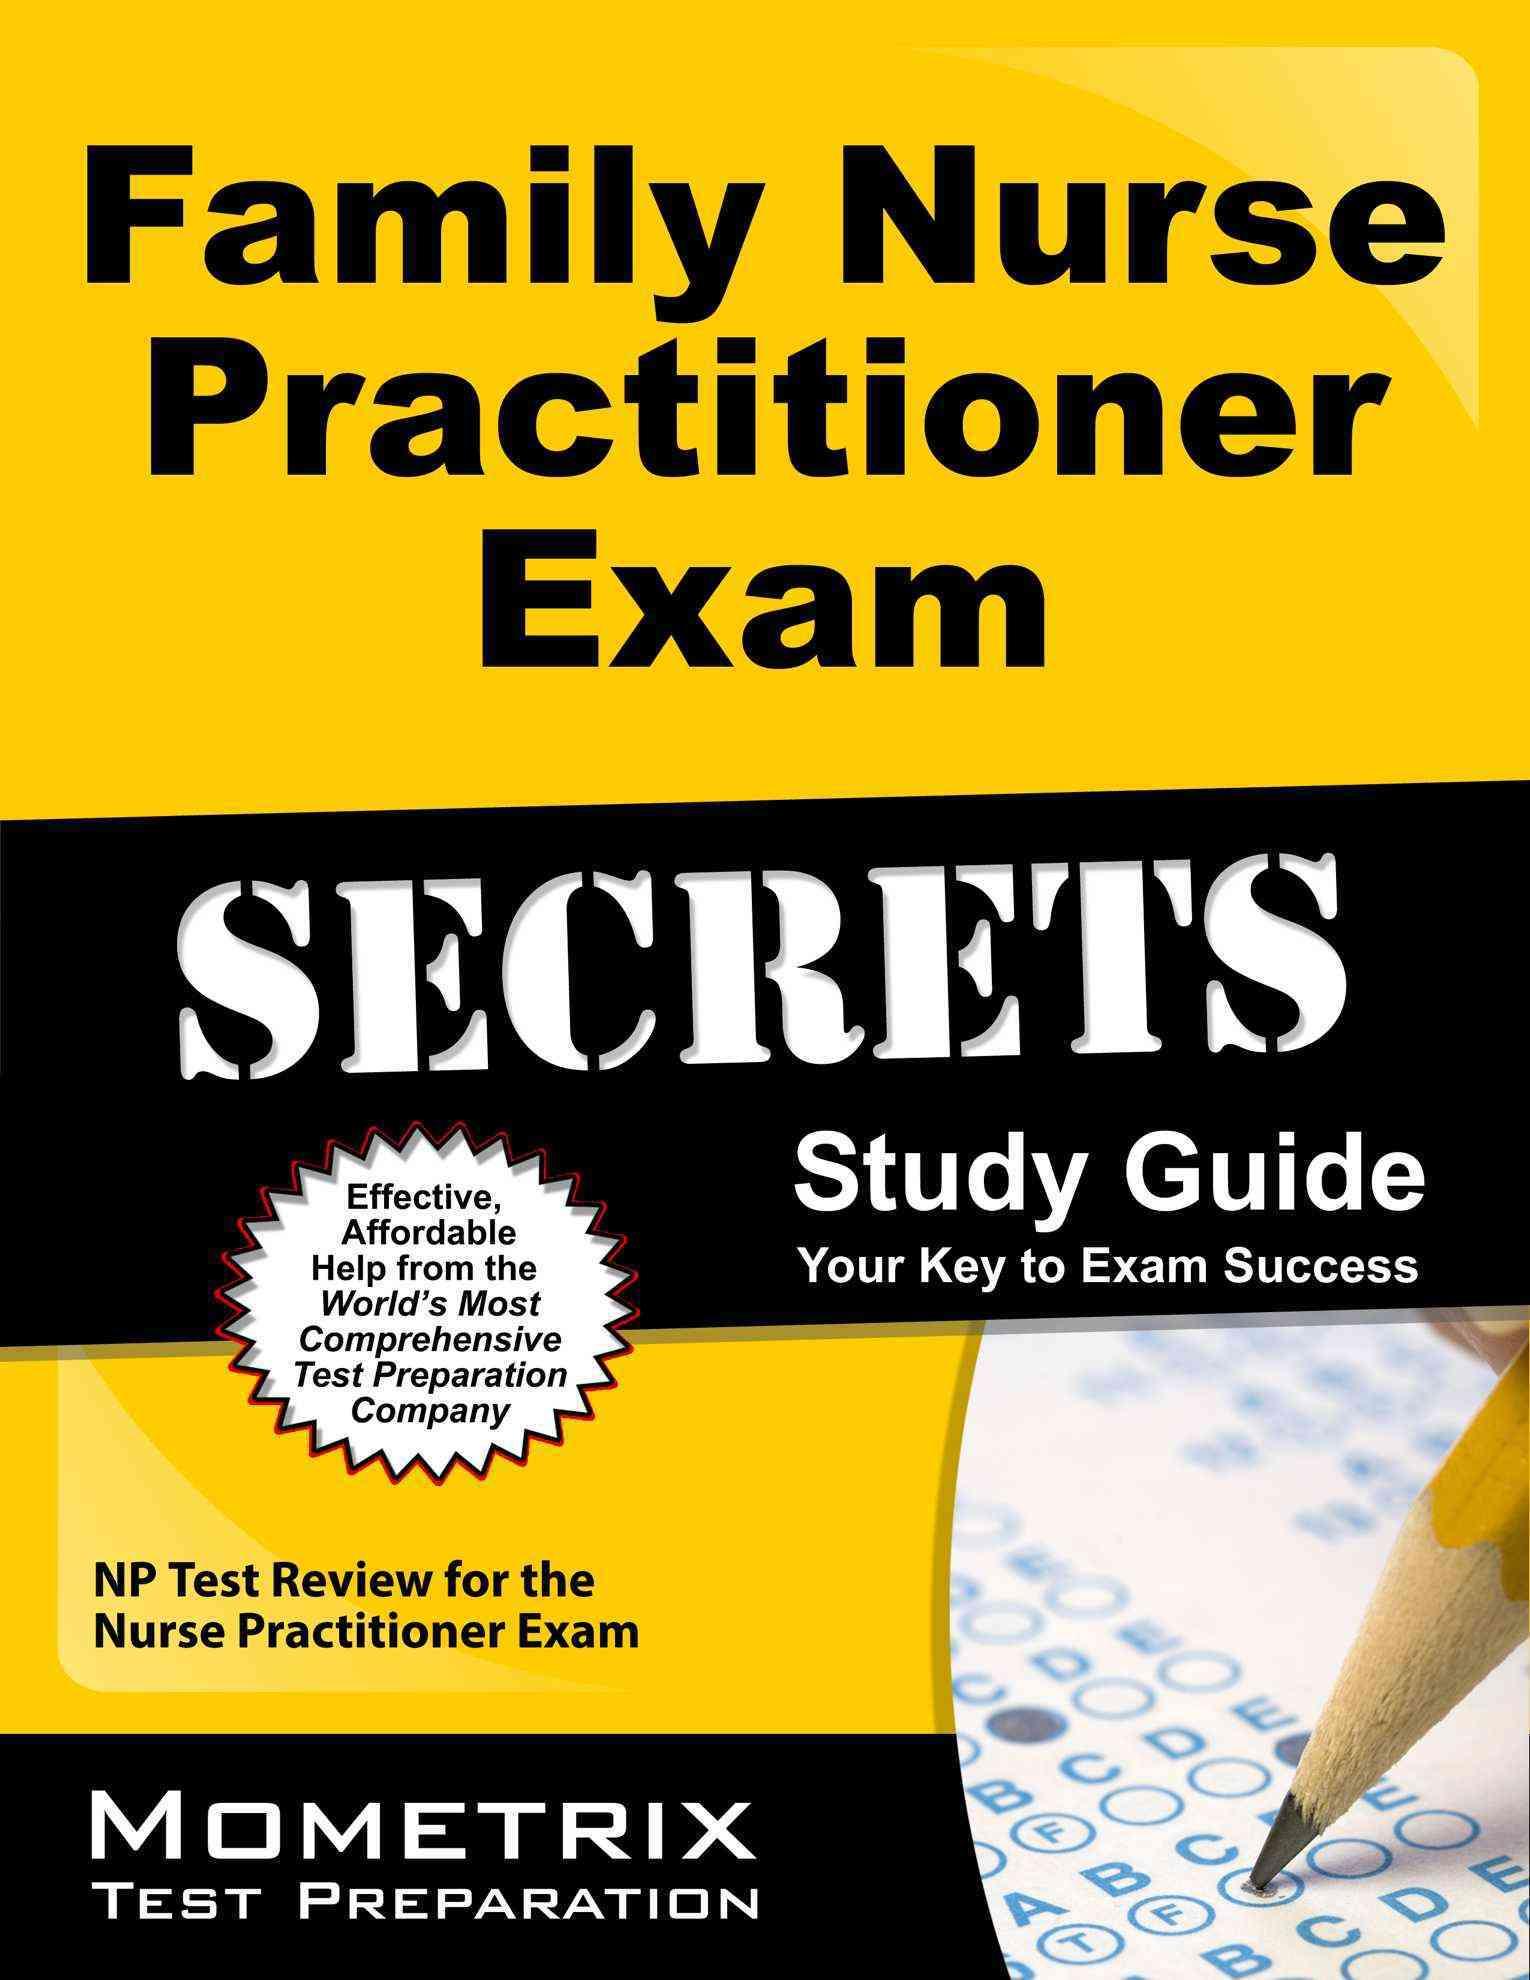 Family Nurse Practitioner Exam Secrets: NP Test Review for the Nurse Practitioner Exam (Paperback)